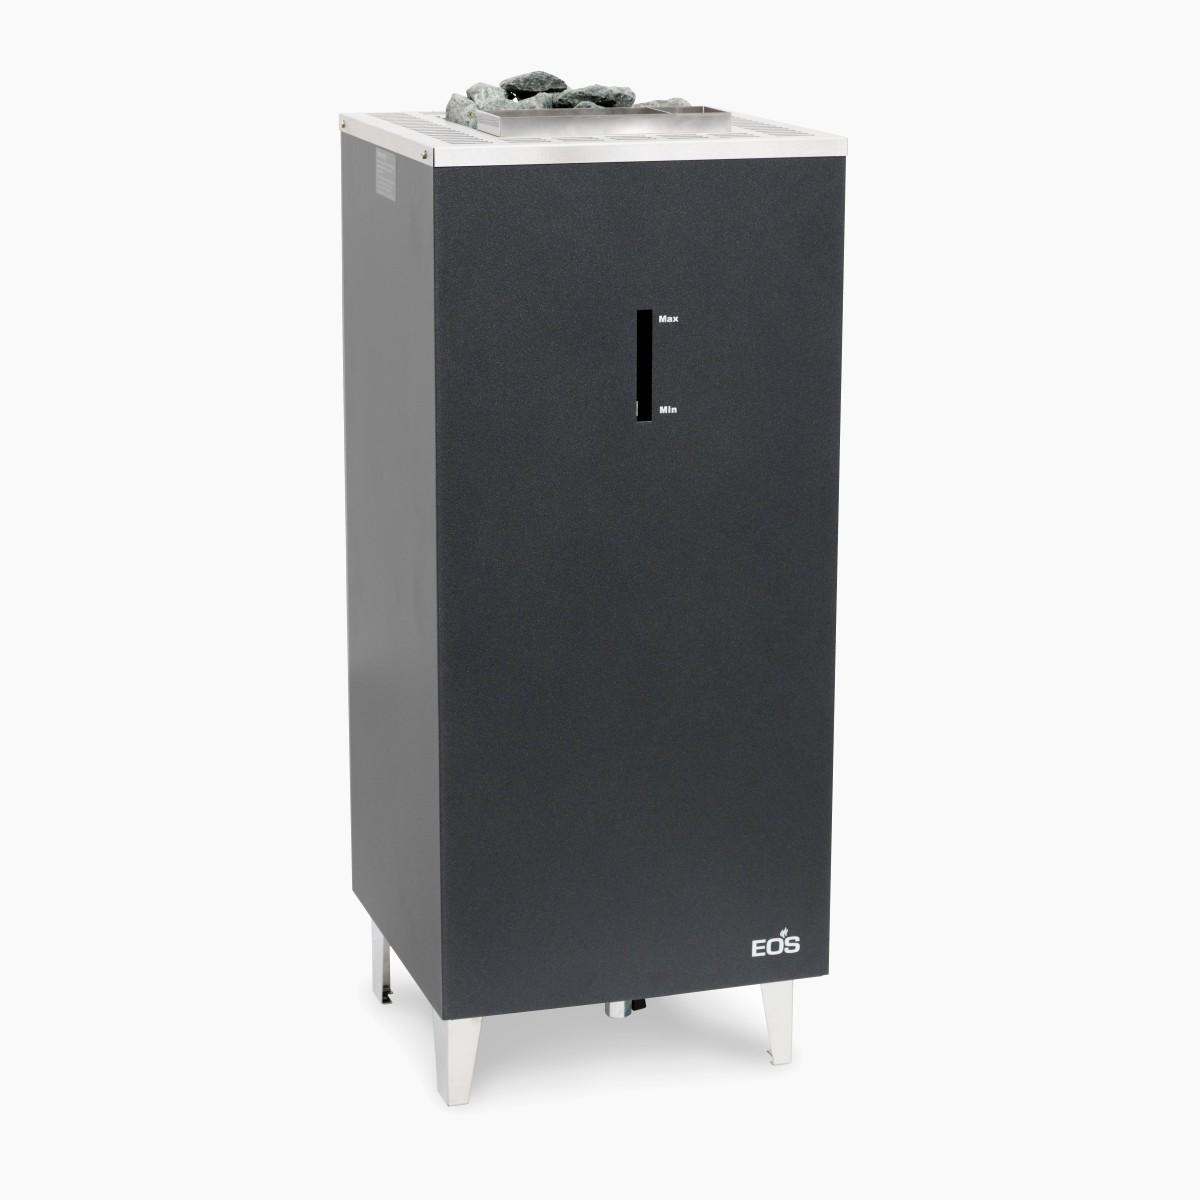 10,5 kW